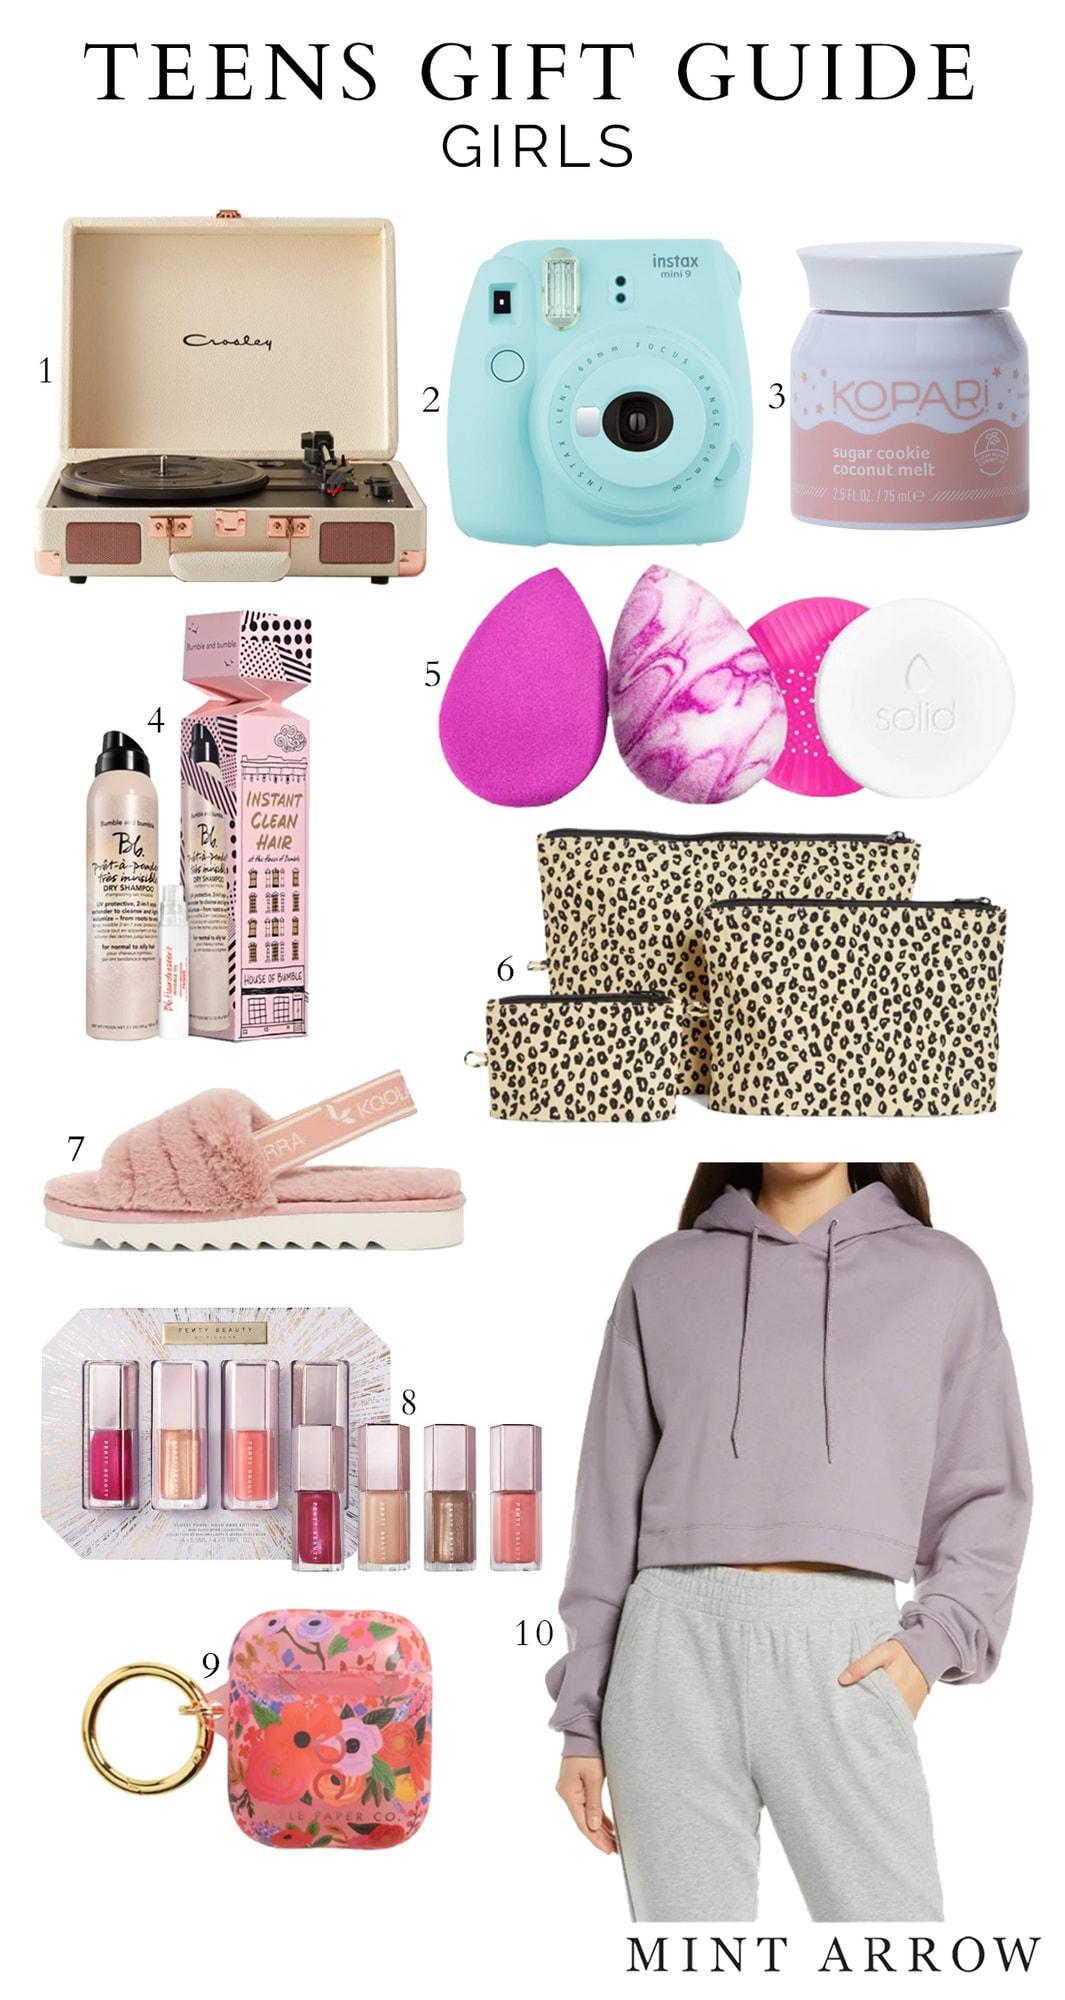 teens gift guide for girls